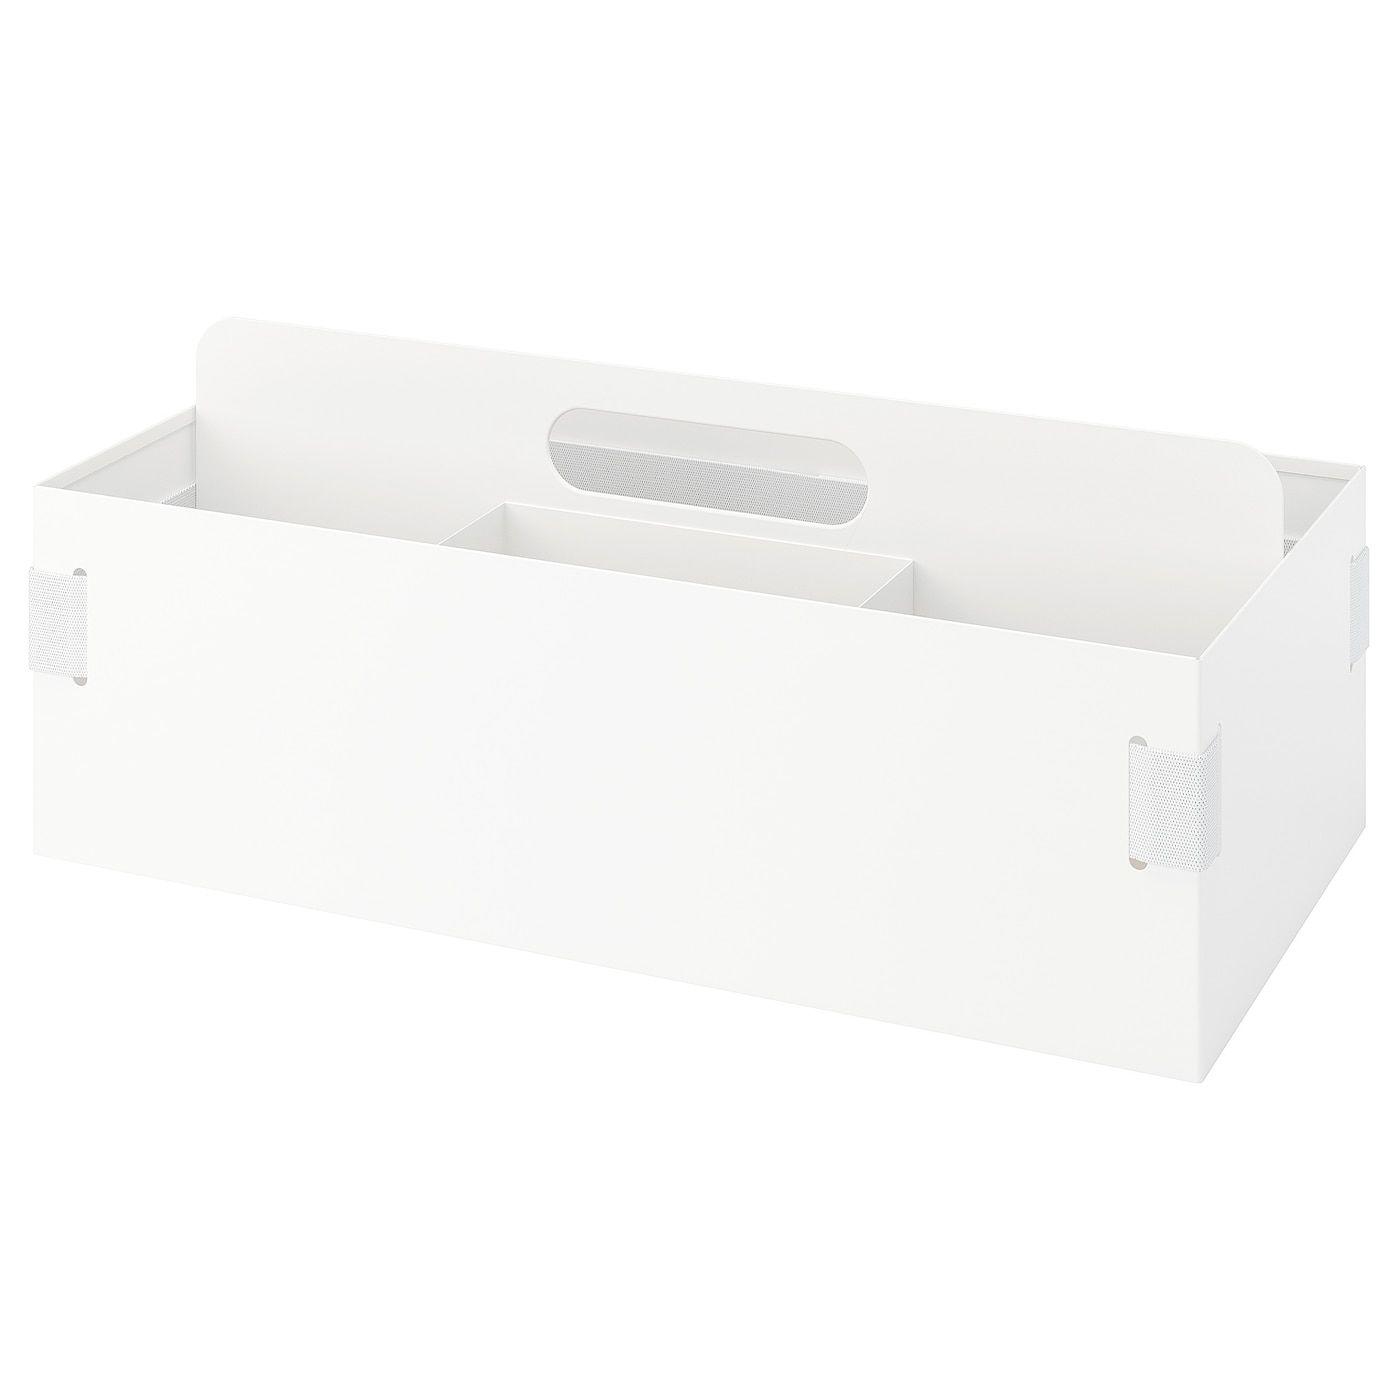 Kvissle Desk Organizer 7x14 X5 In 2020 Desk Organization Desk Organization Ikea Usb Stick